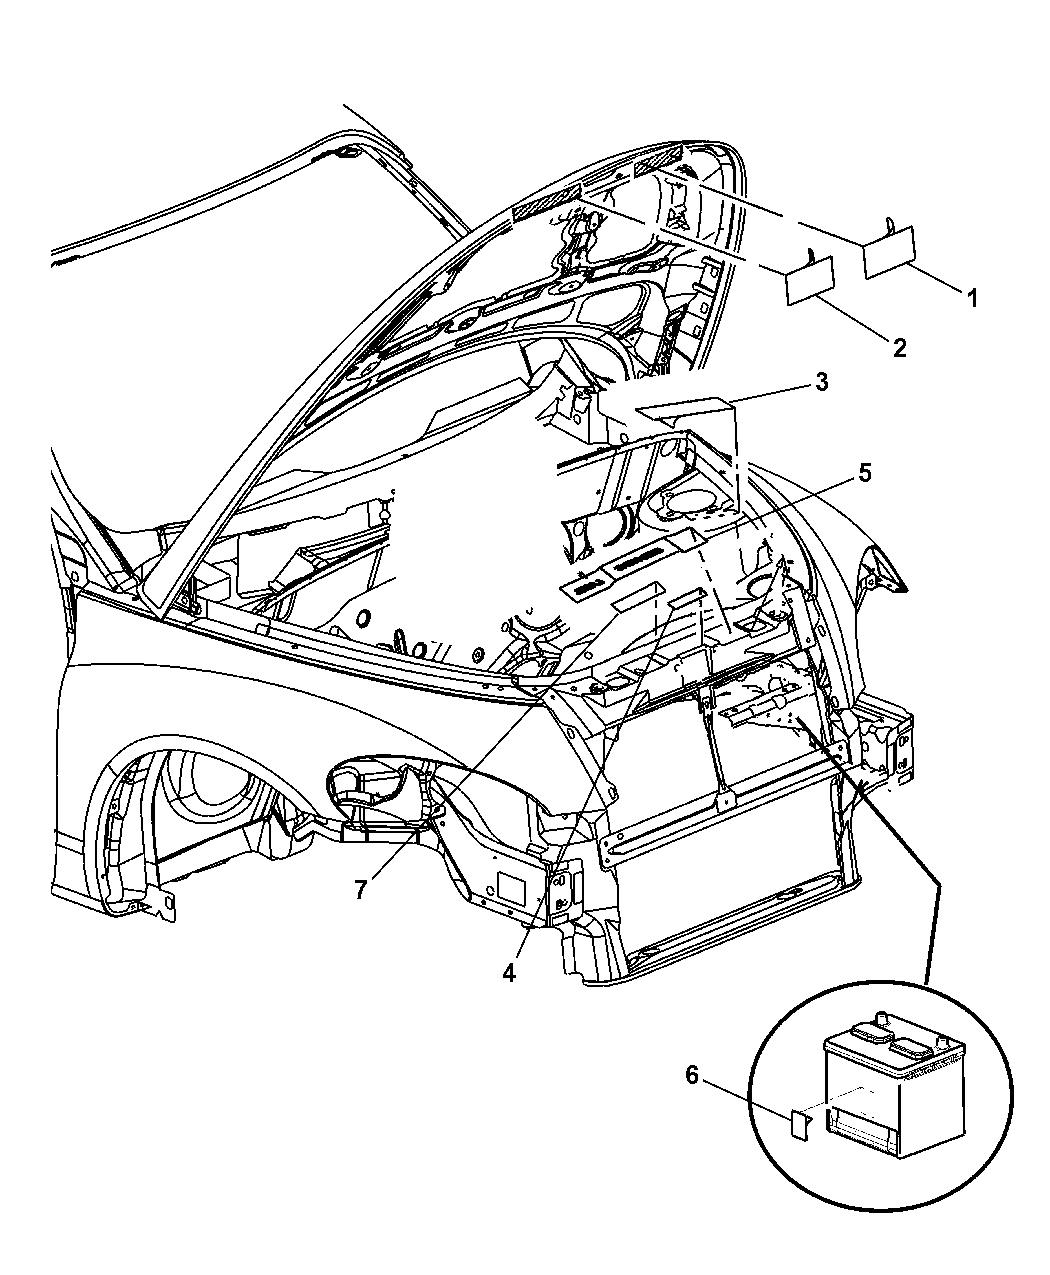 2003 Chrysler Pt Cruiser Engine Compartment